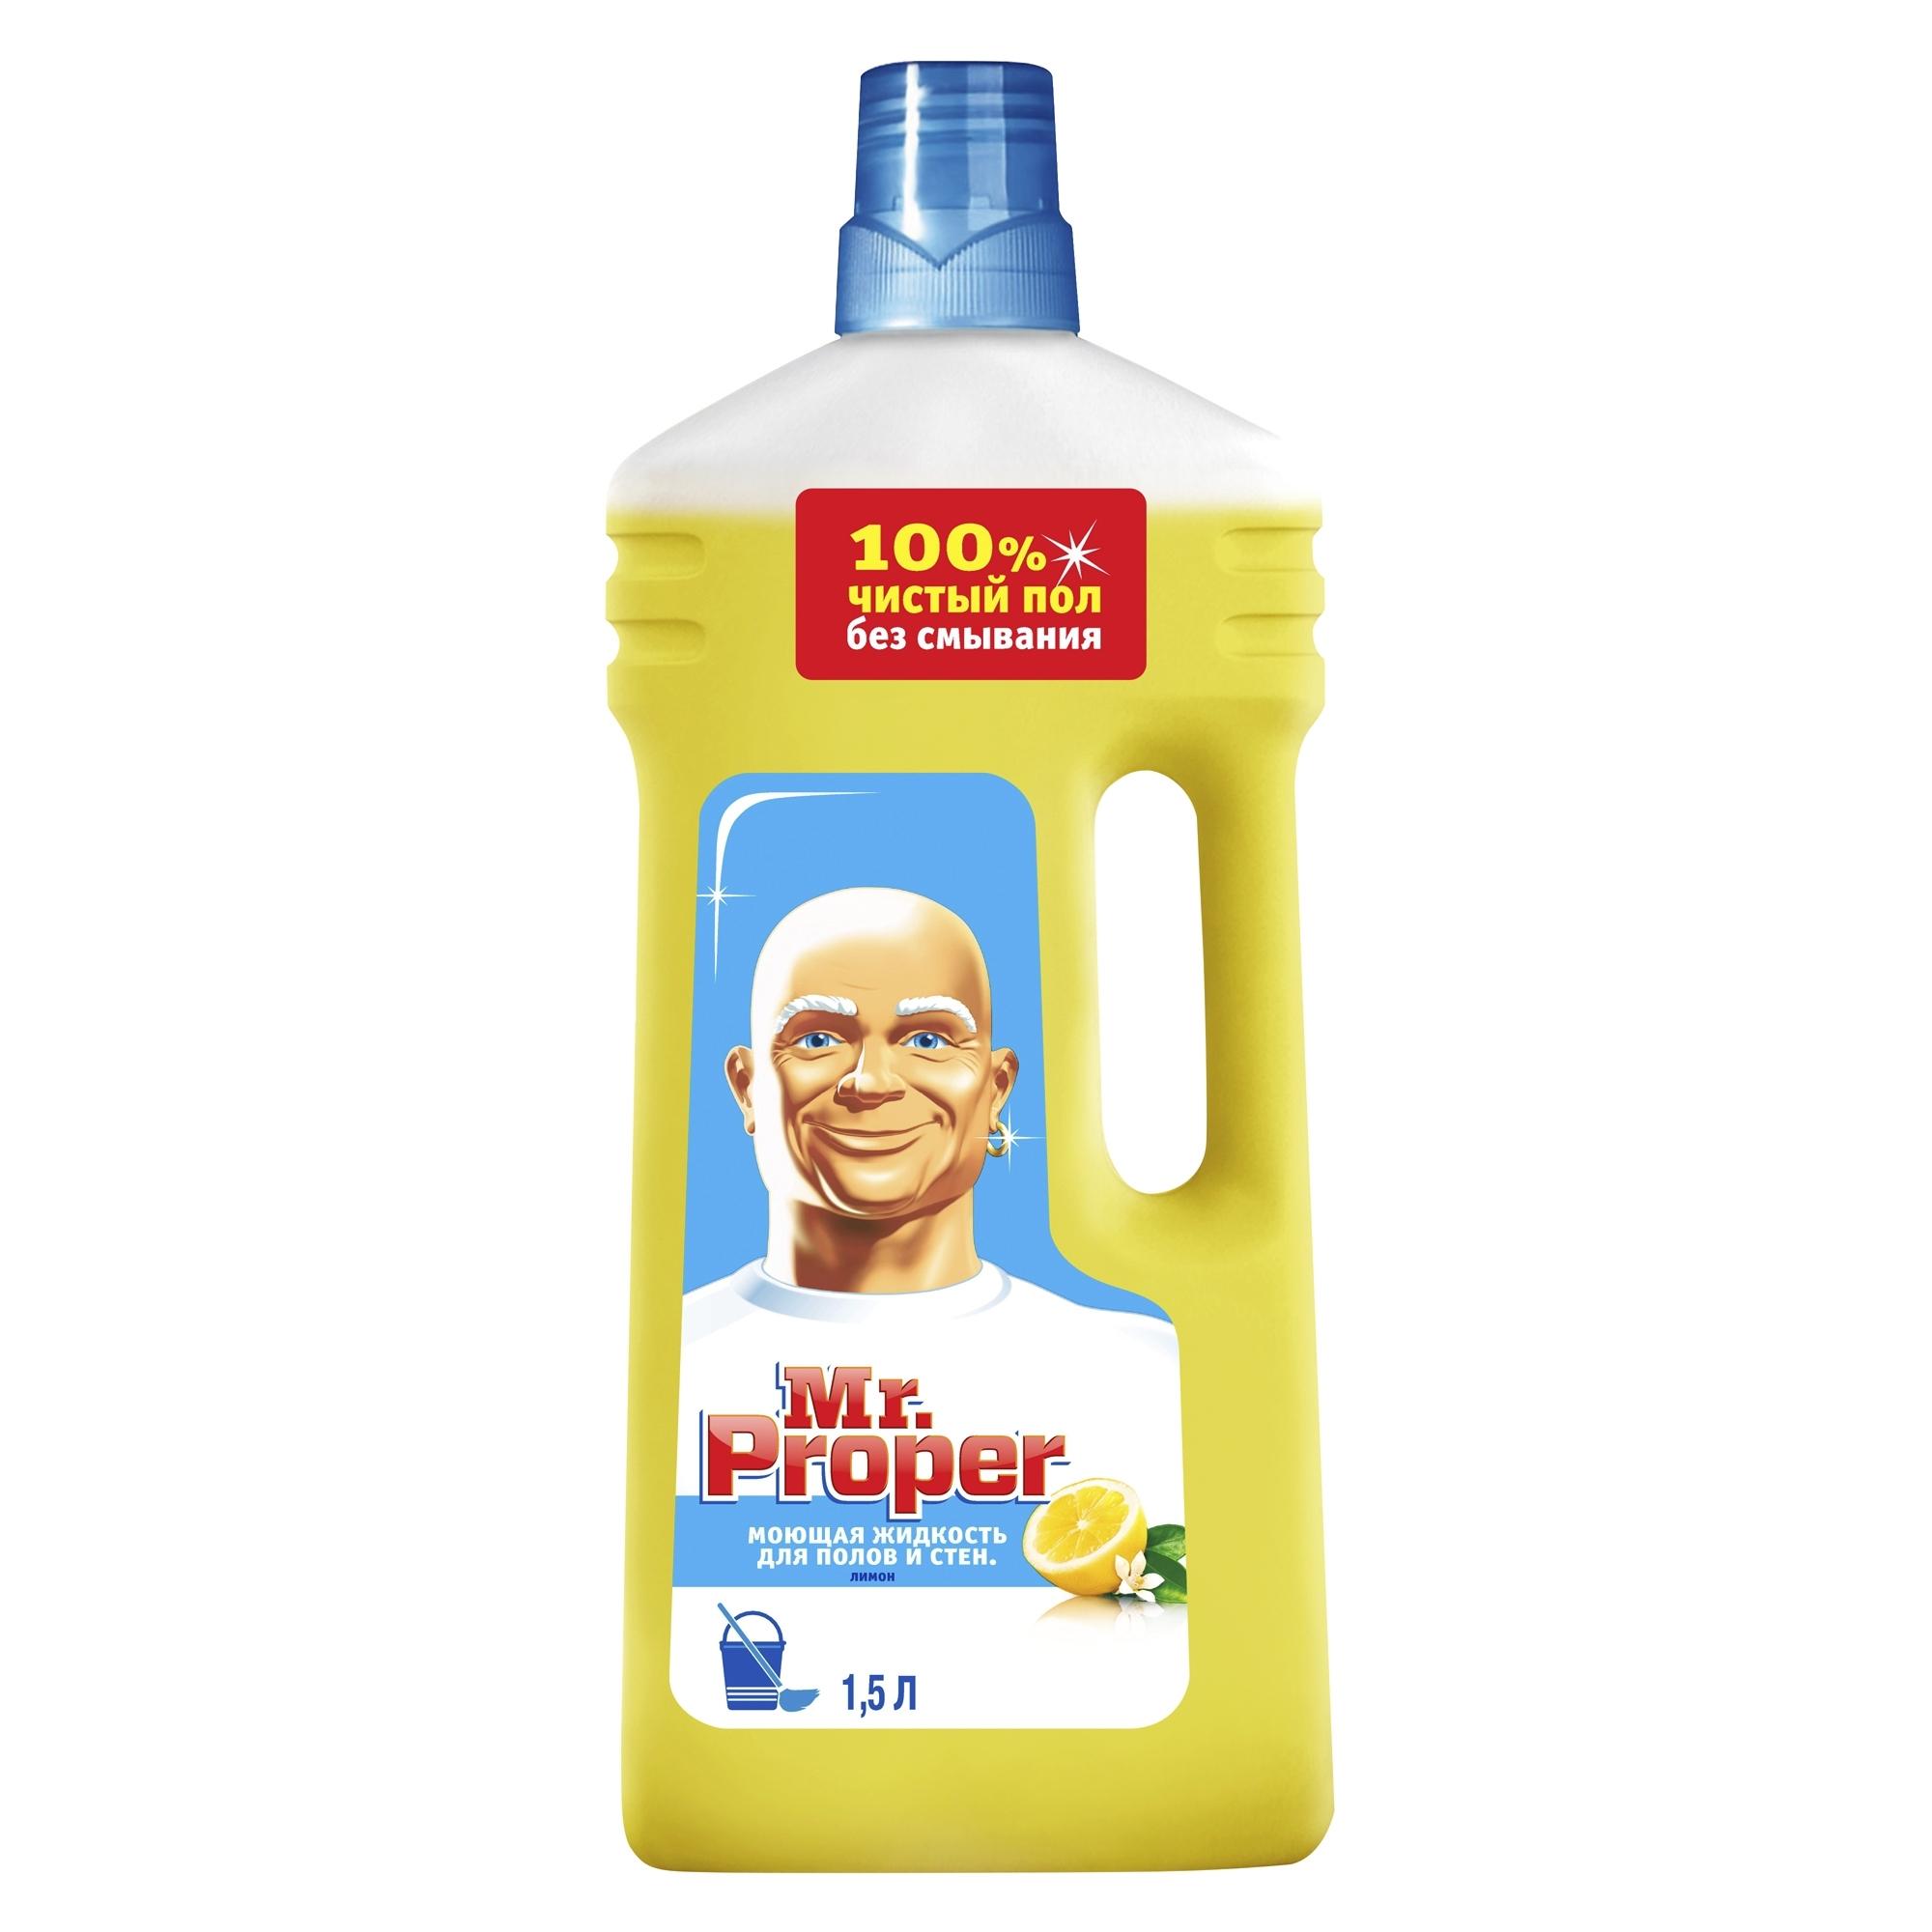 ������ �������� Mr Proper ��������� ��� ������ 1.5 � �����